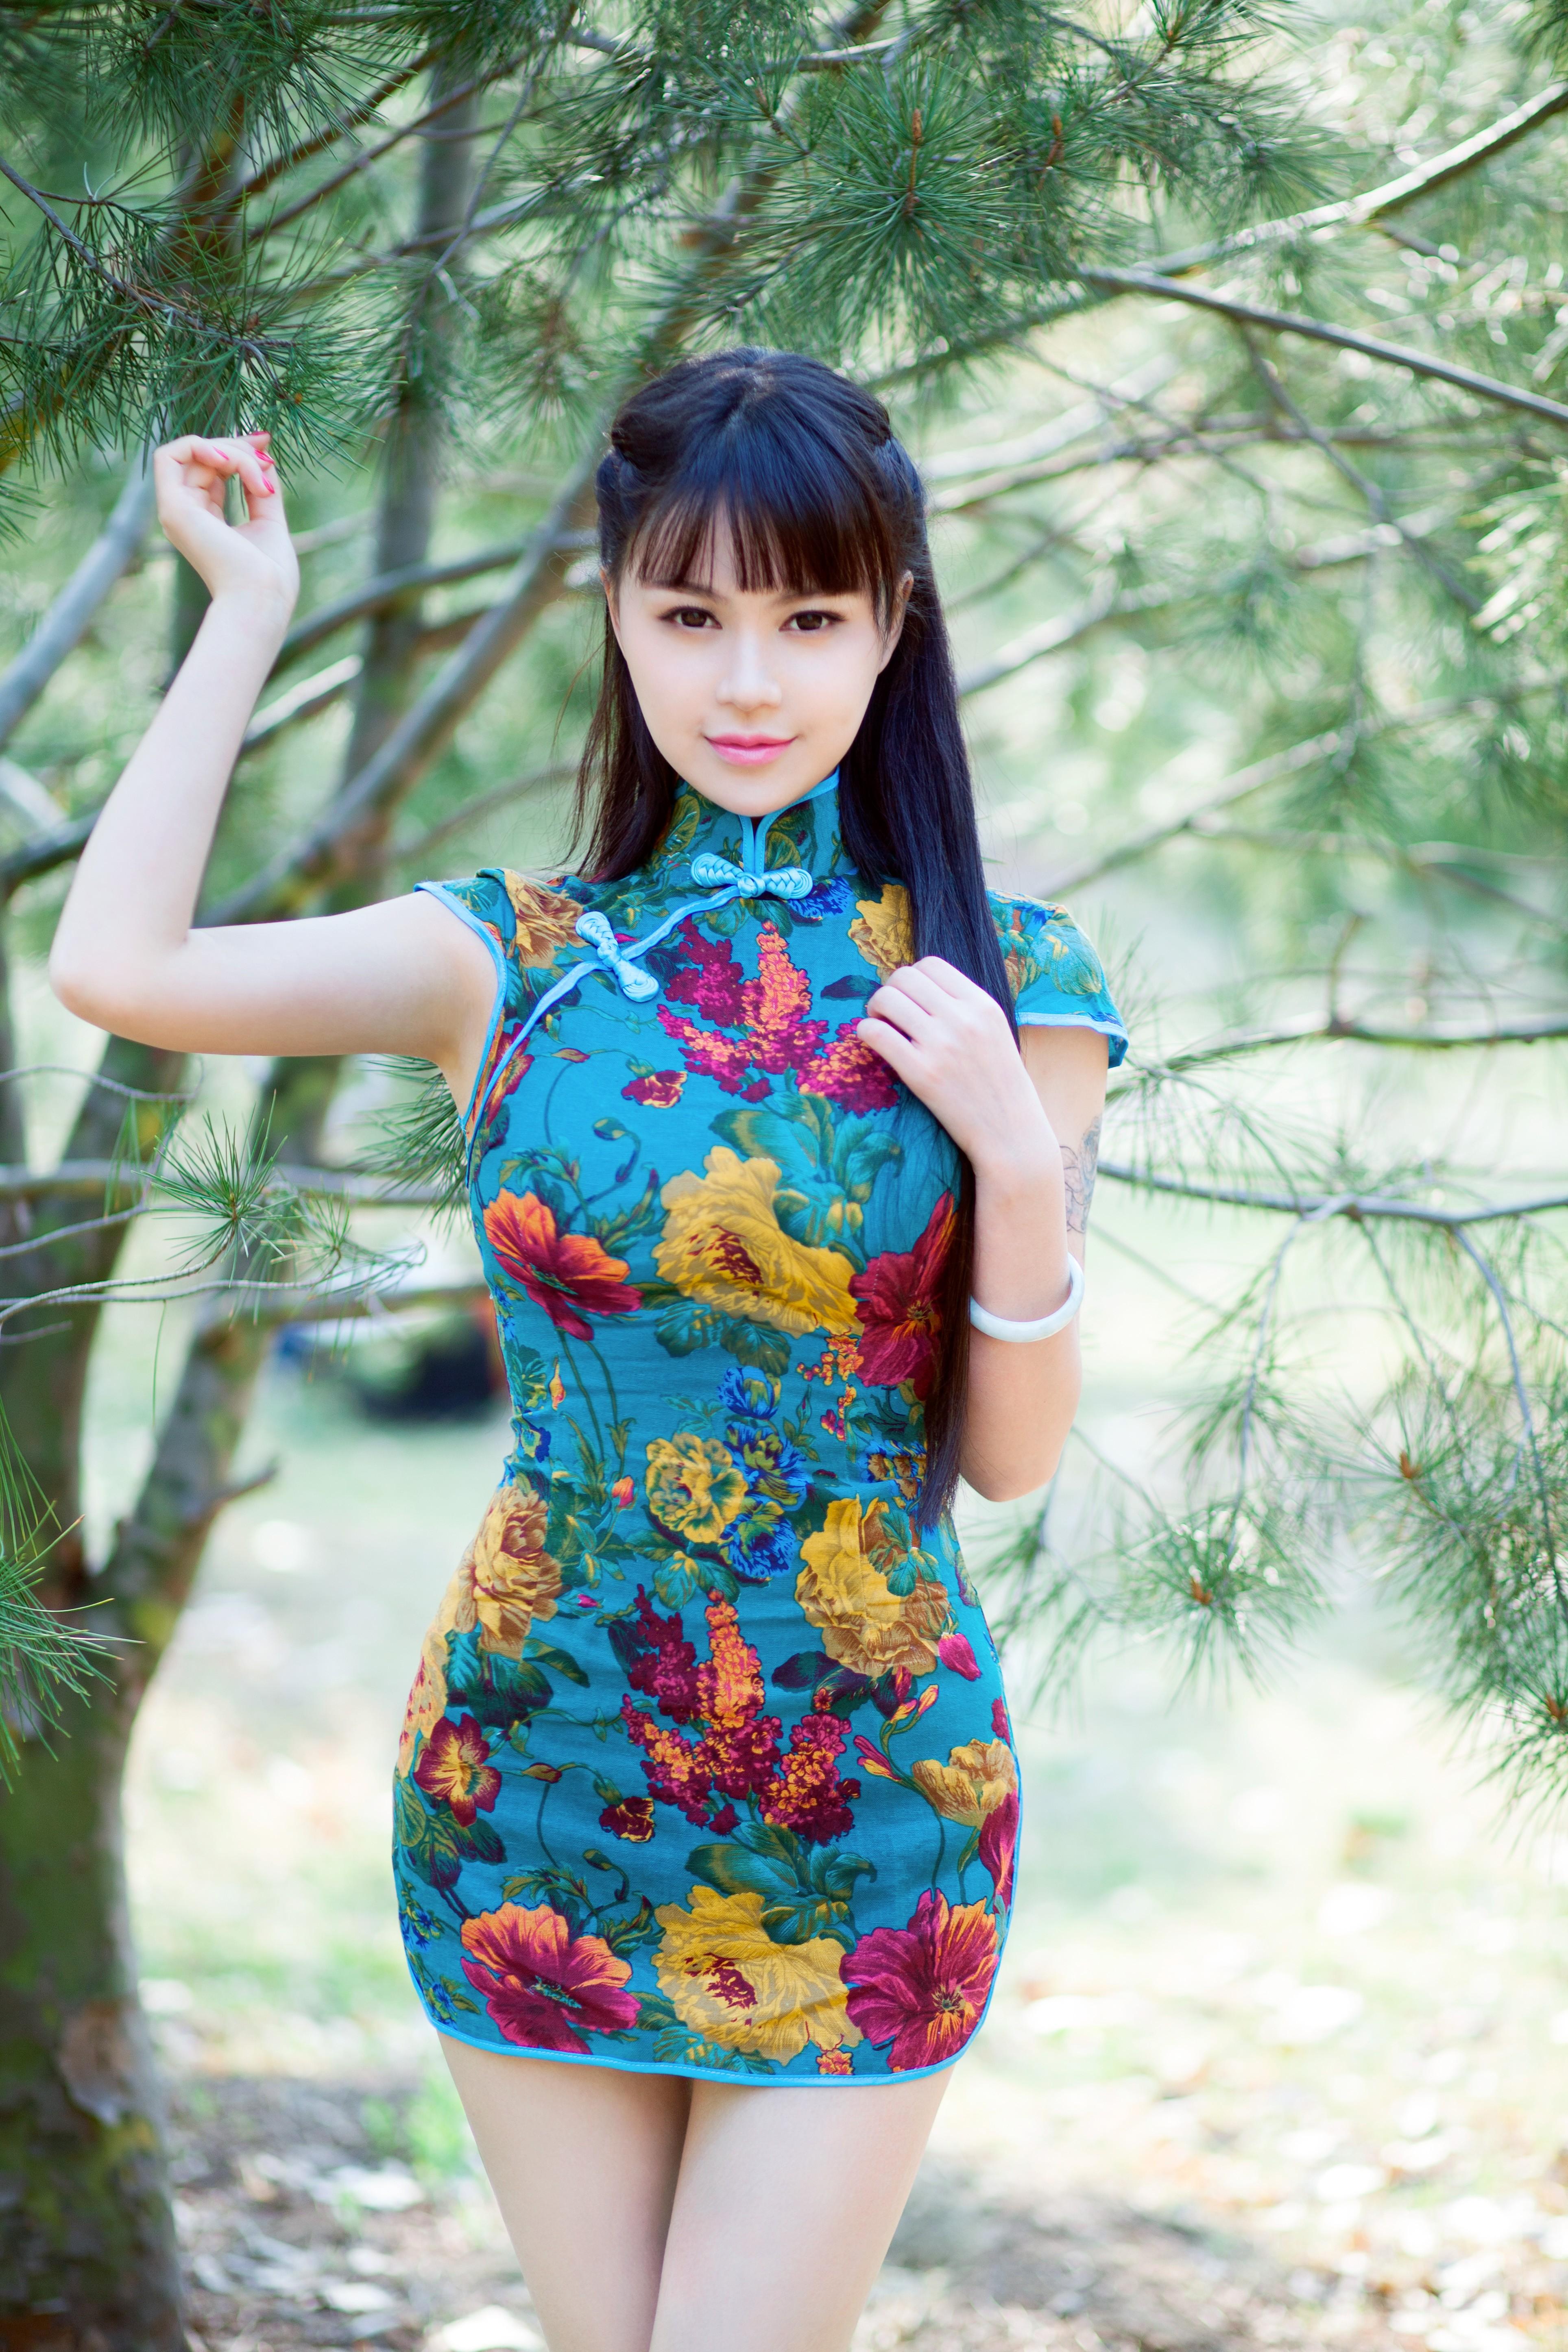 Pink new Japanese Women's Silk Satin Kimono Yukata Evening ... |Japanese Blue Sweater Vest For Women